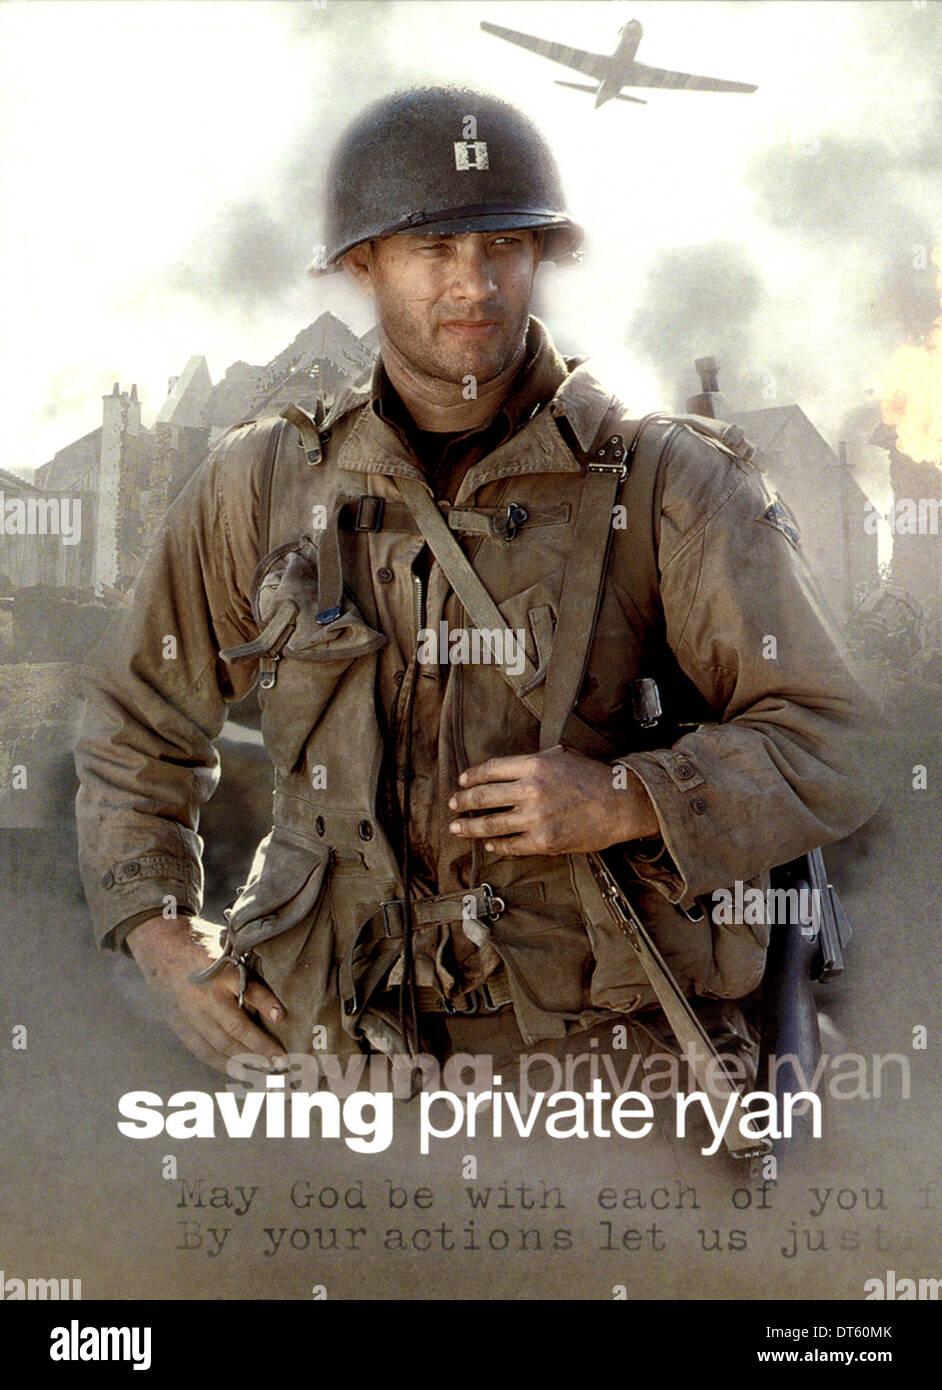 Tom Hanks Poster Saving Private Ryan 1998 Stock Photo Alamy